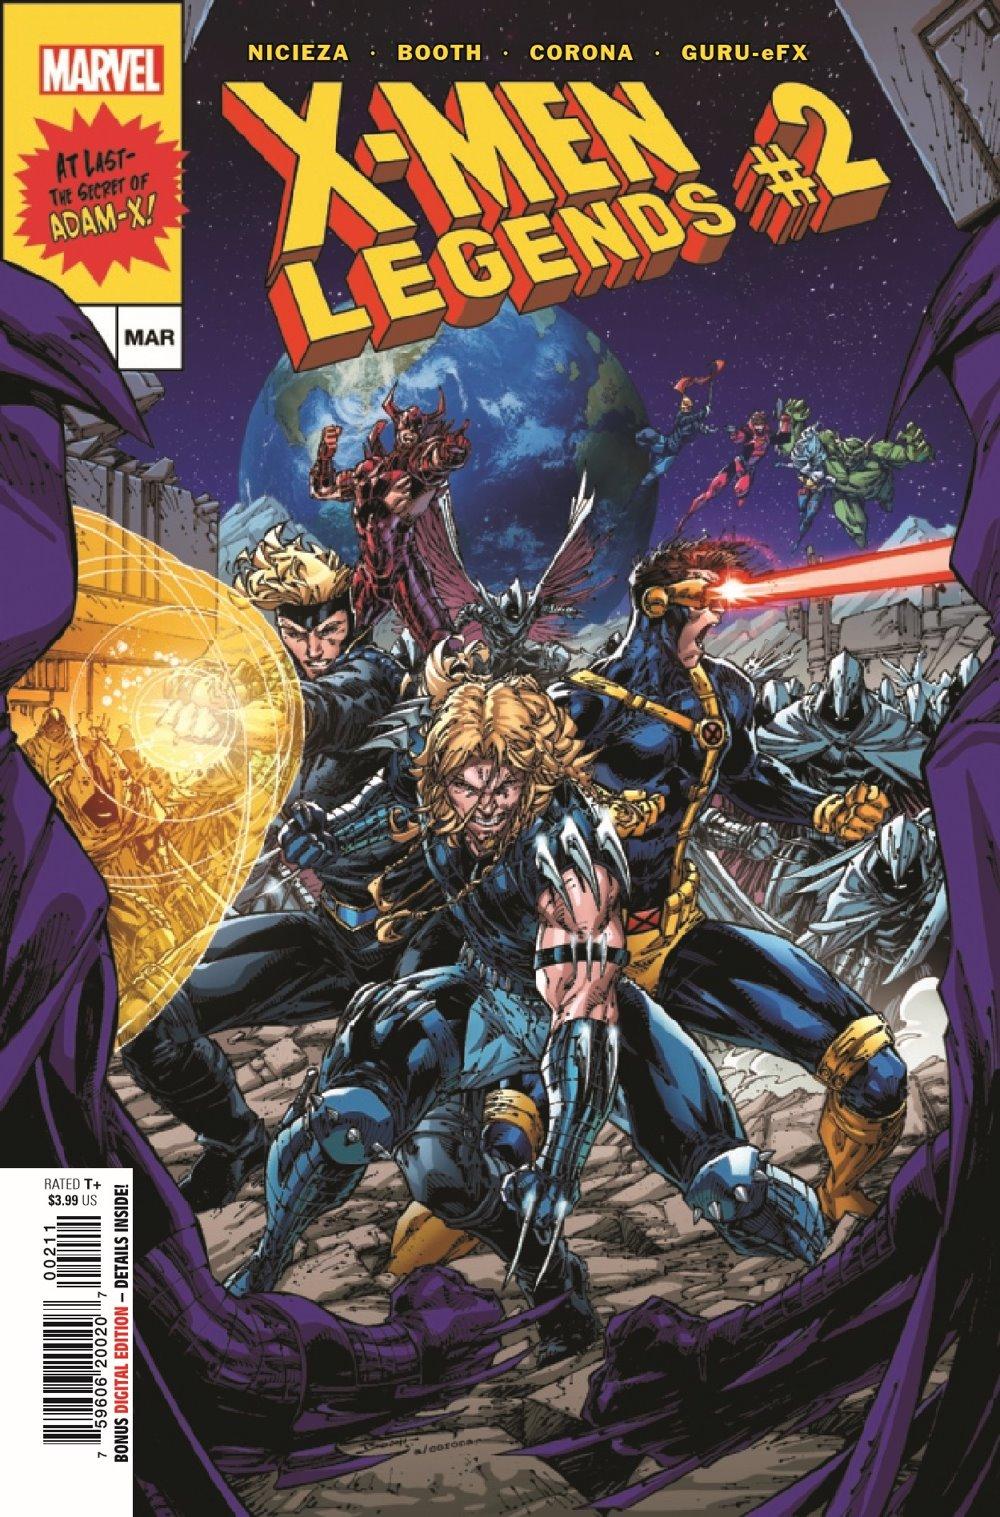 XMLEGENDS2021002_Preview-1 ComicList Previews: X-MEN LEGENDS #2